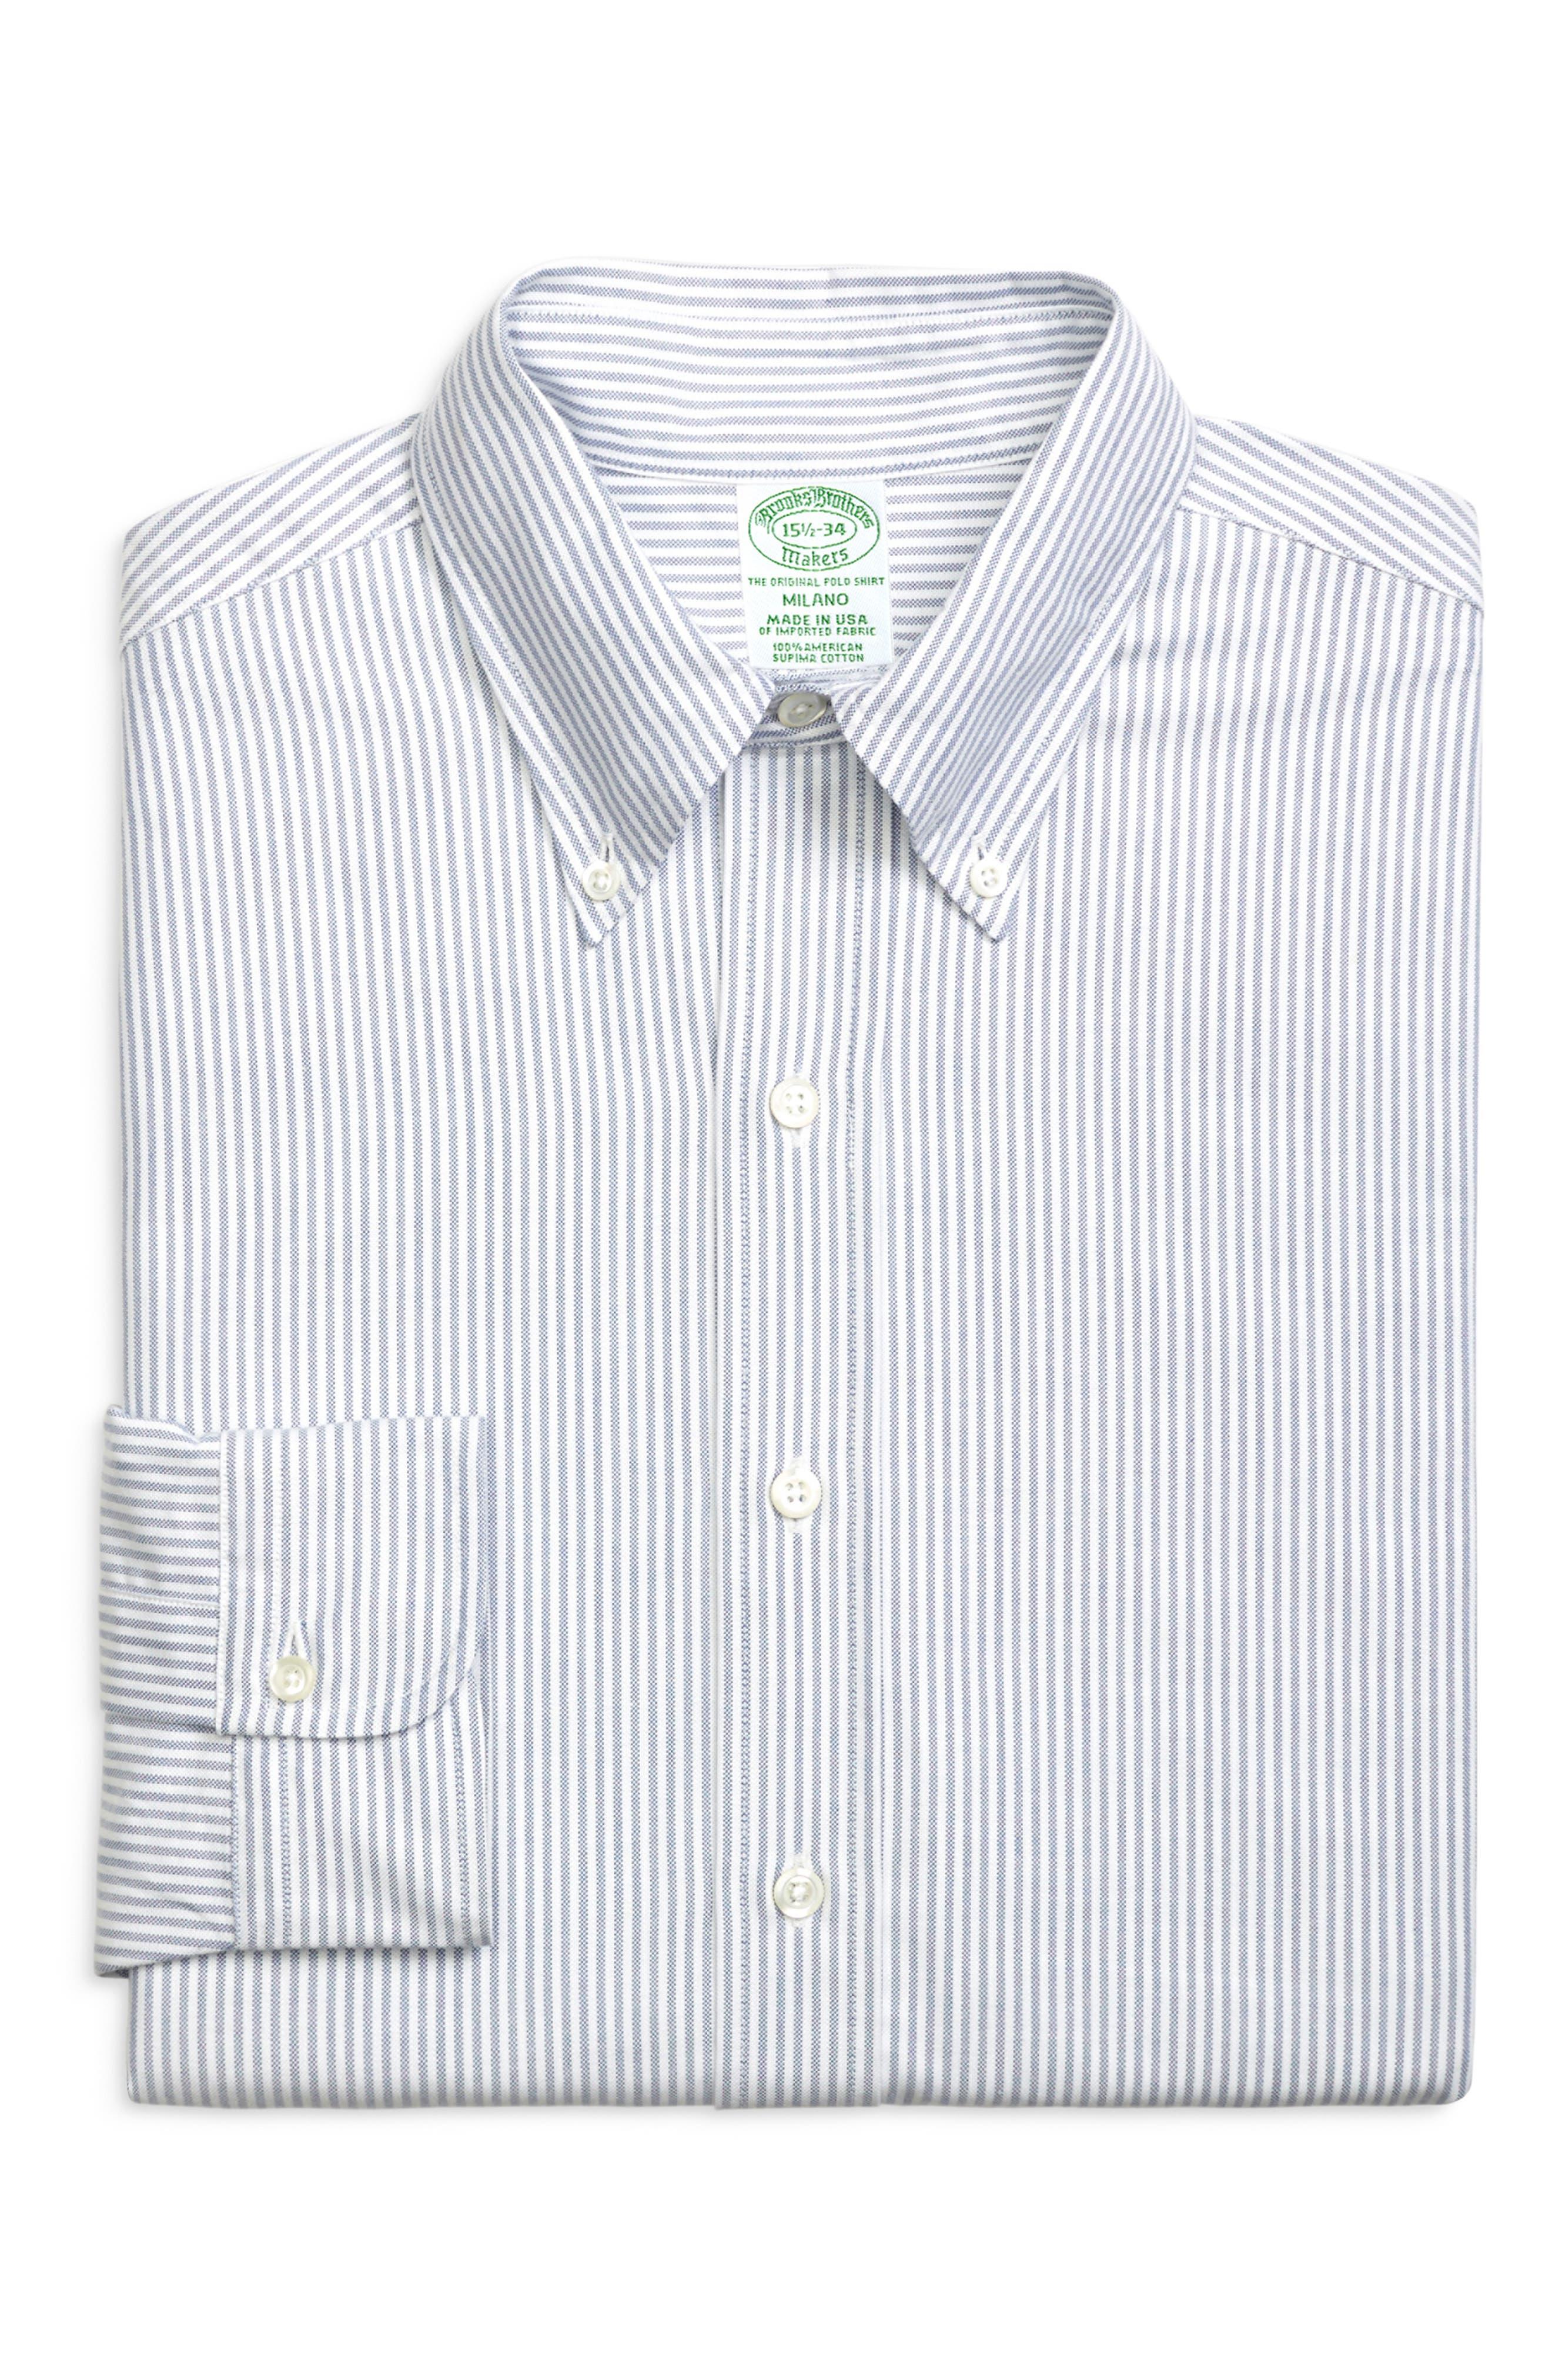 Milano Slim Fit Stripe Dress Shirt